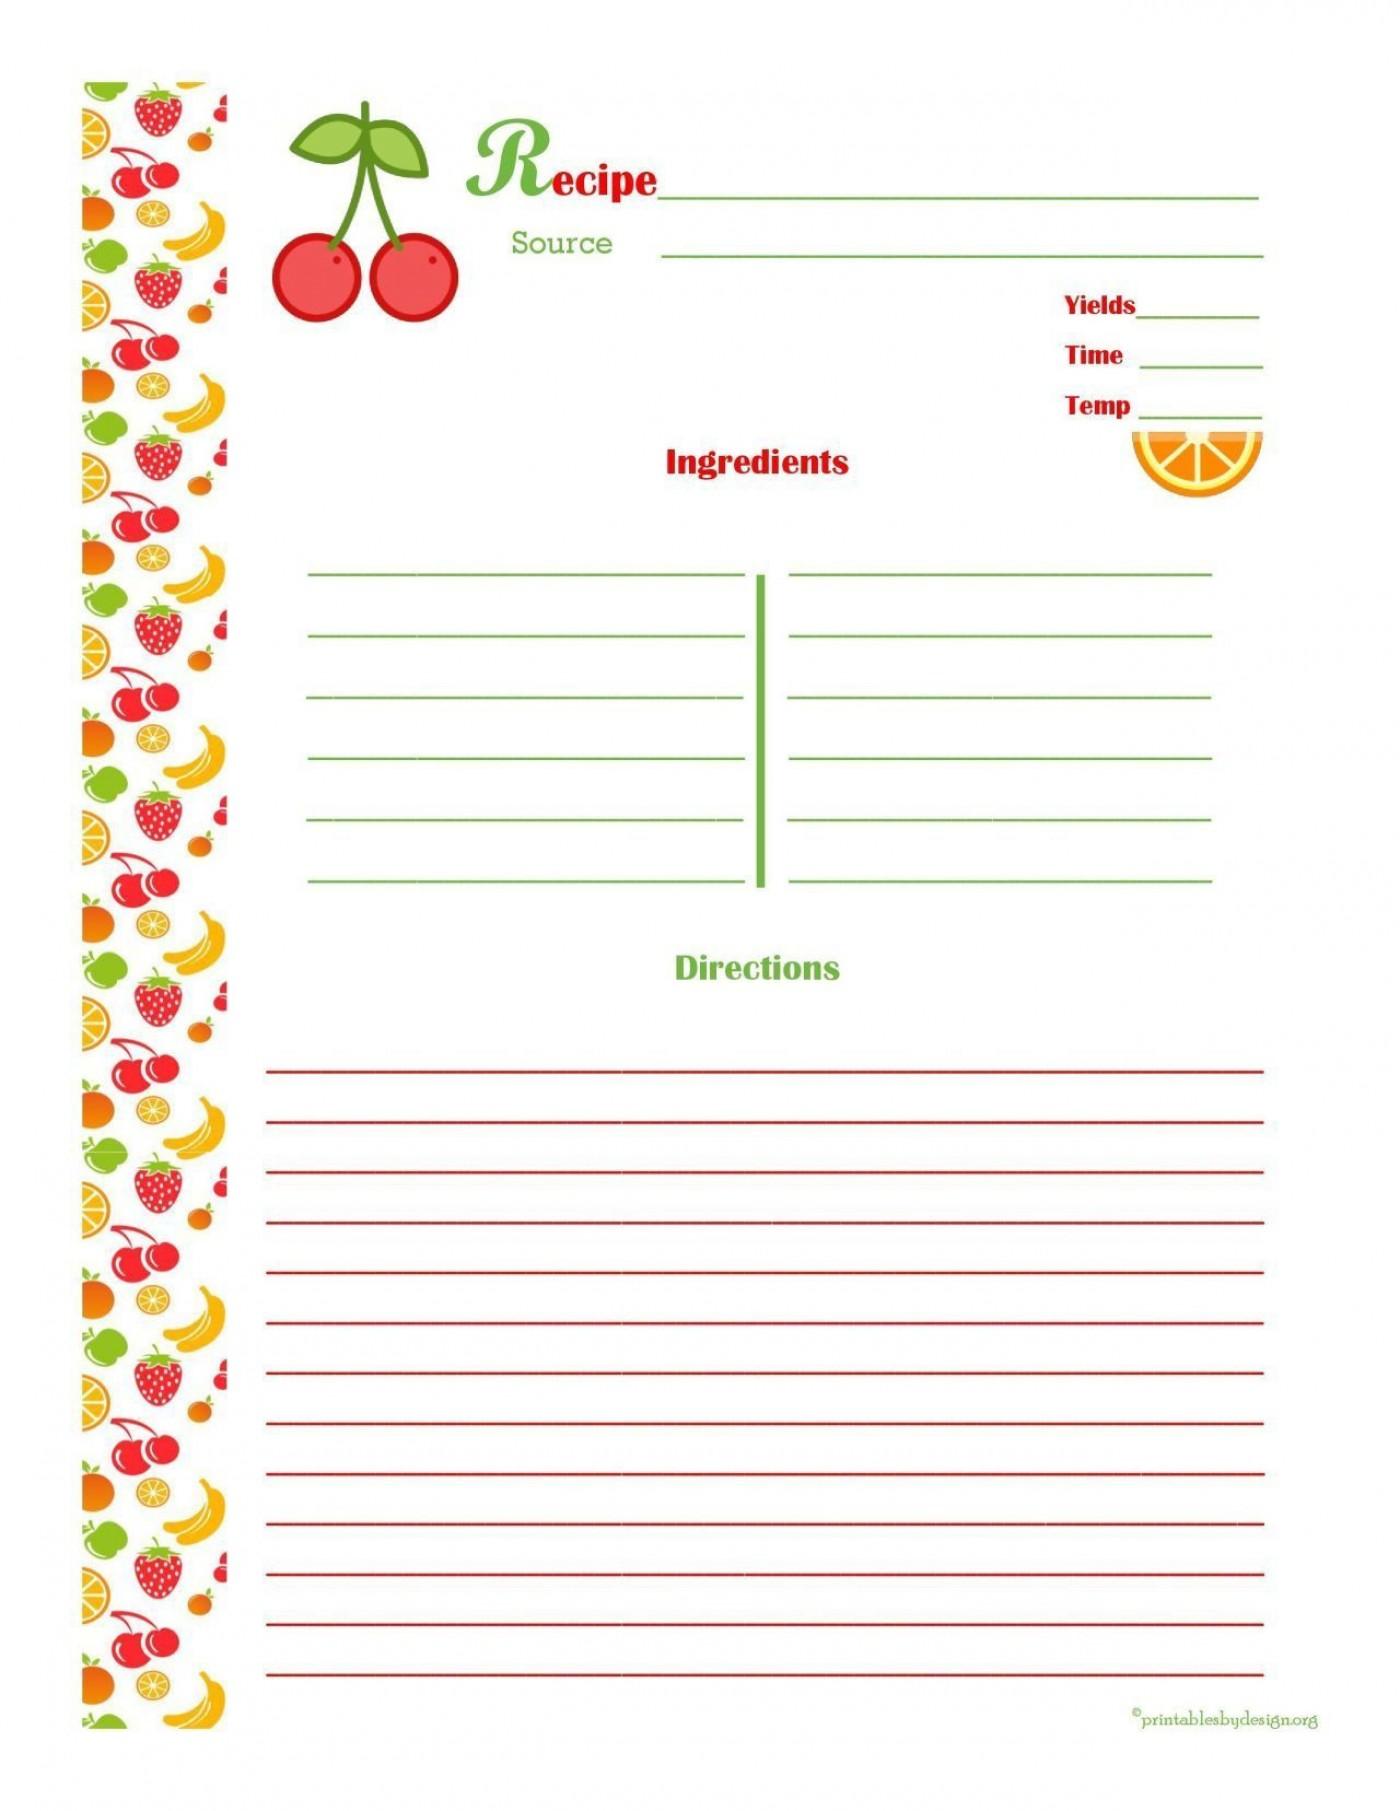 001 Striking 3 X 5 Recipe Card Template Microsoft Word Idea 1400